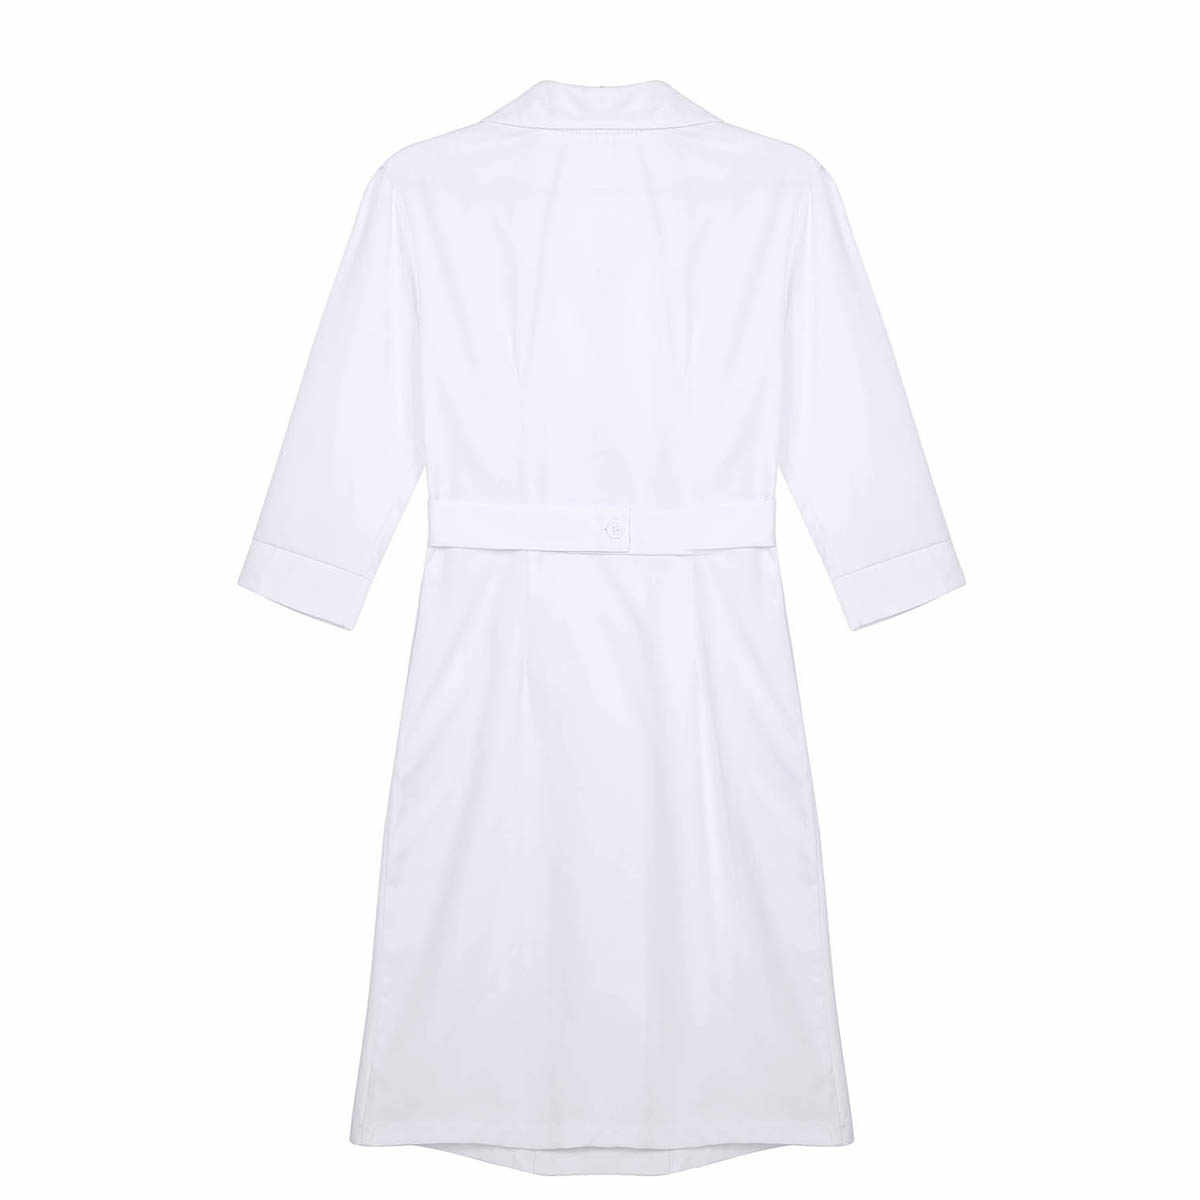 TiaoBug נשים למבוגרים מעבדה רפואי שירותי מעיל רופא תלבושות דש צווארון הברך אורך לבן Slim סקסי אחות אחיד שמלה